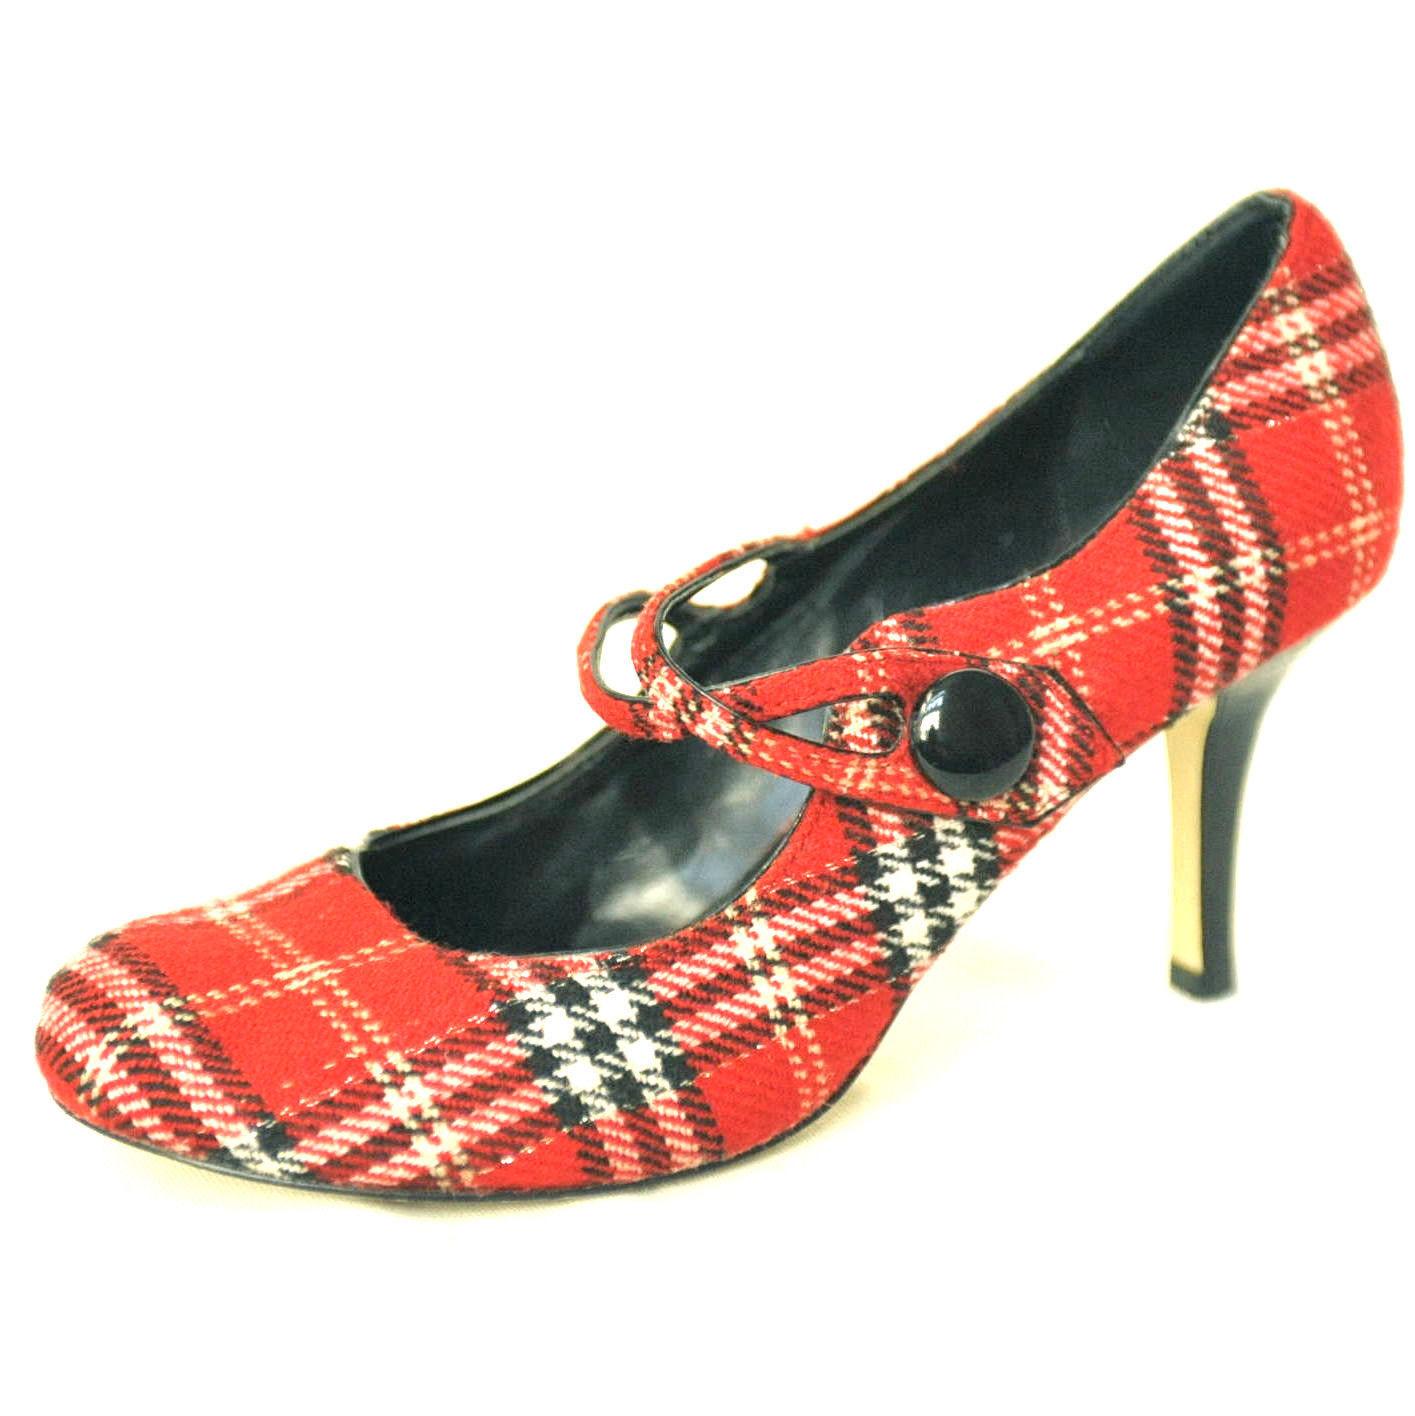 428b9936b3a Womens Steve Madden P-LANIE Red Nova Check Plaid Mary Jane High Heels Shoes  7.5M -  19.99